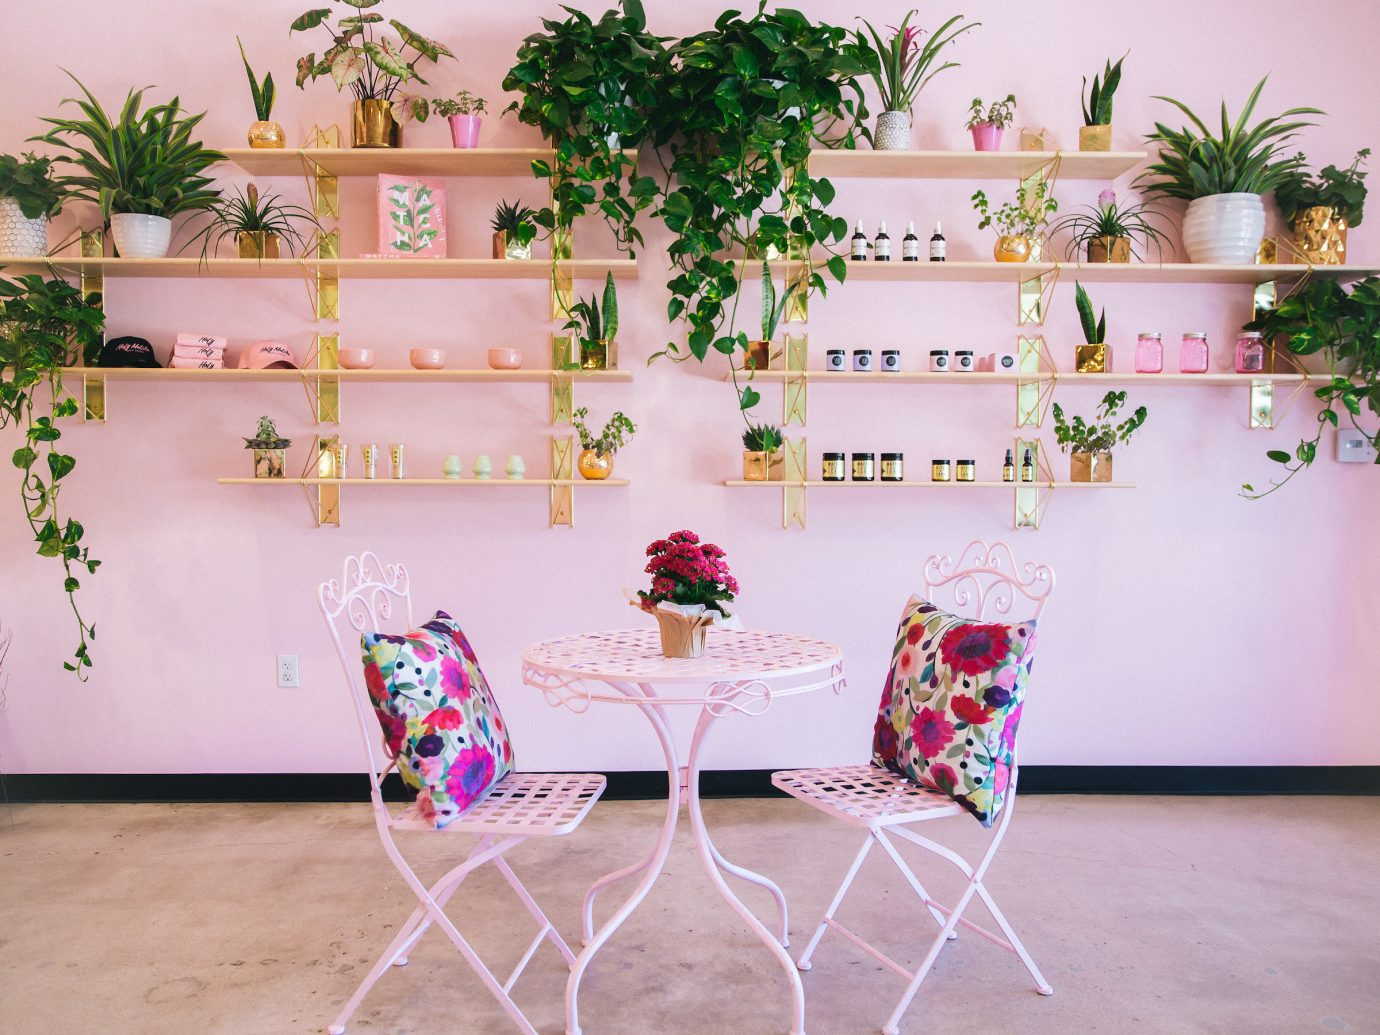 Jetsetter Guides indoor floor pink flower plant furniture floristry table flower arranging Living room flowerpot interior design floral design chair decorated arranged